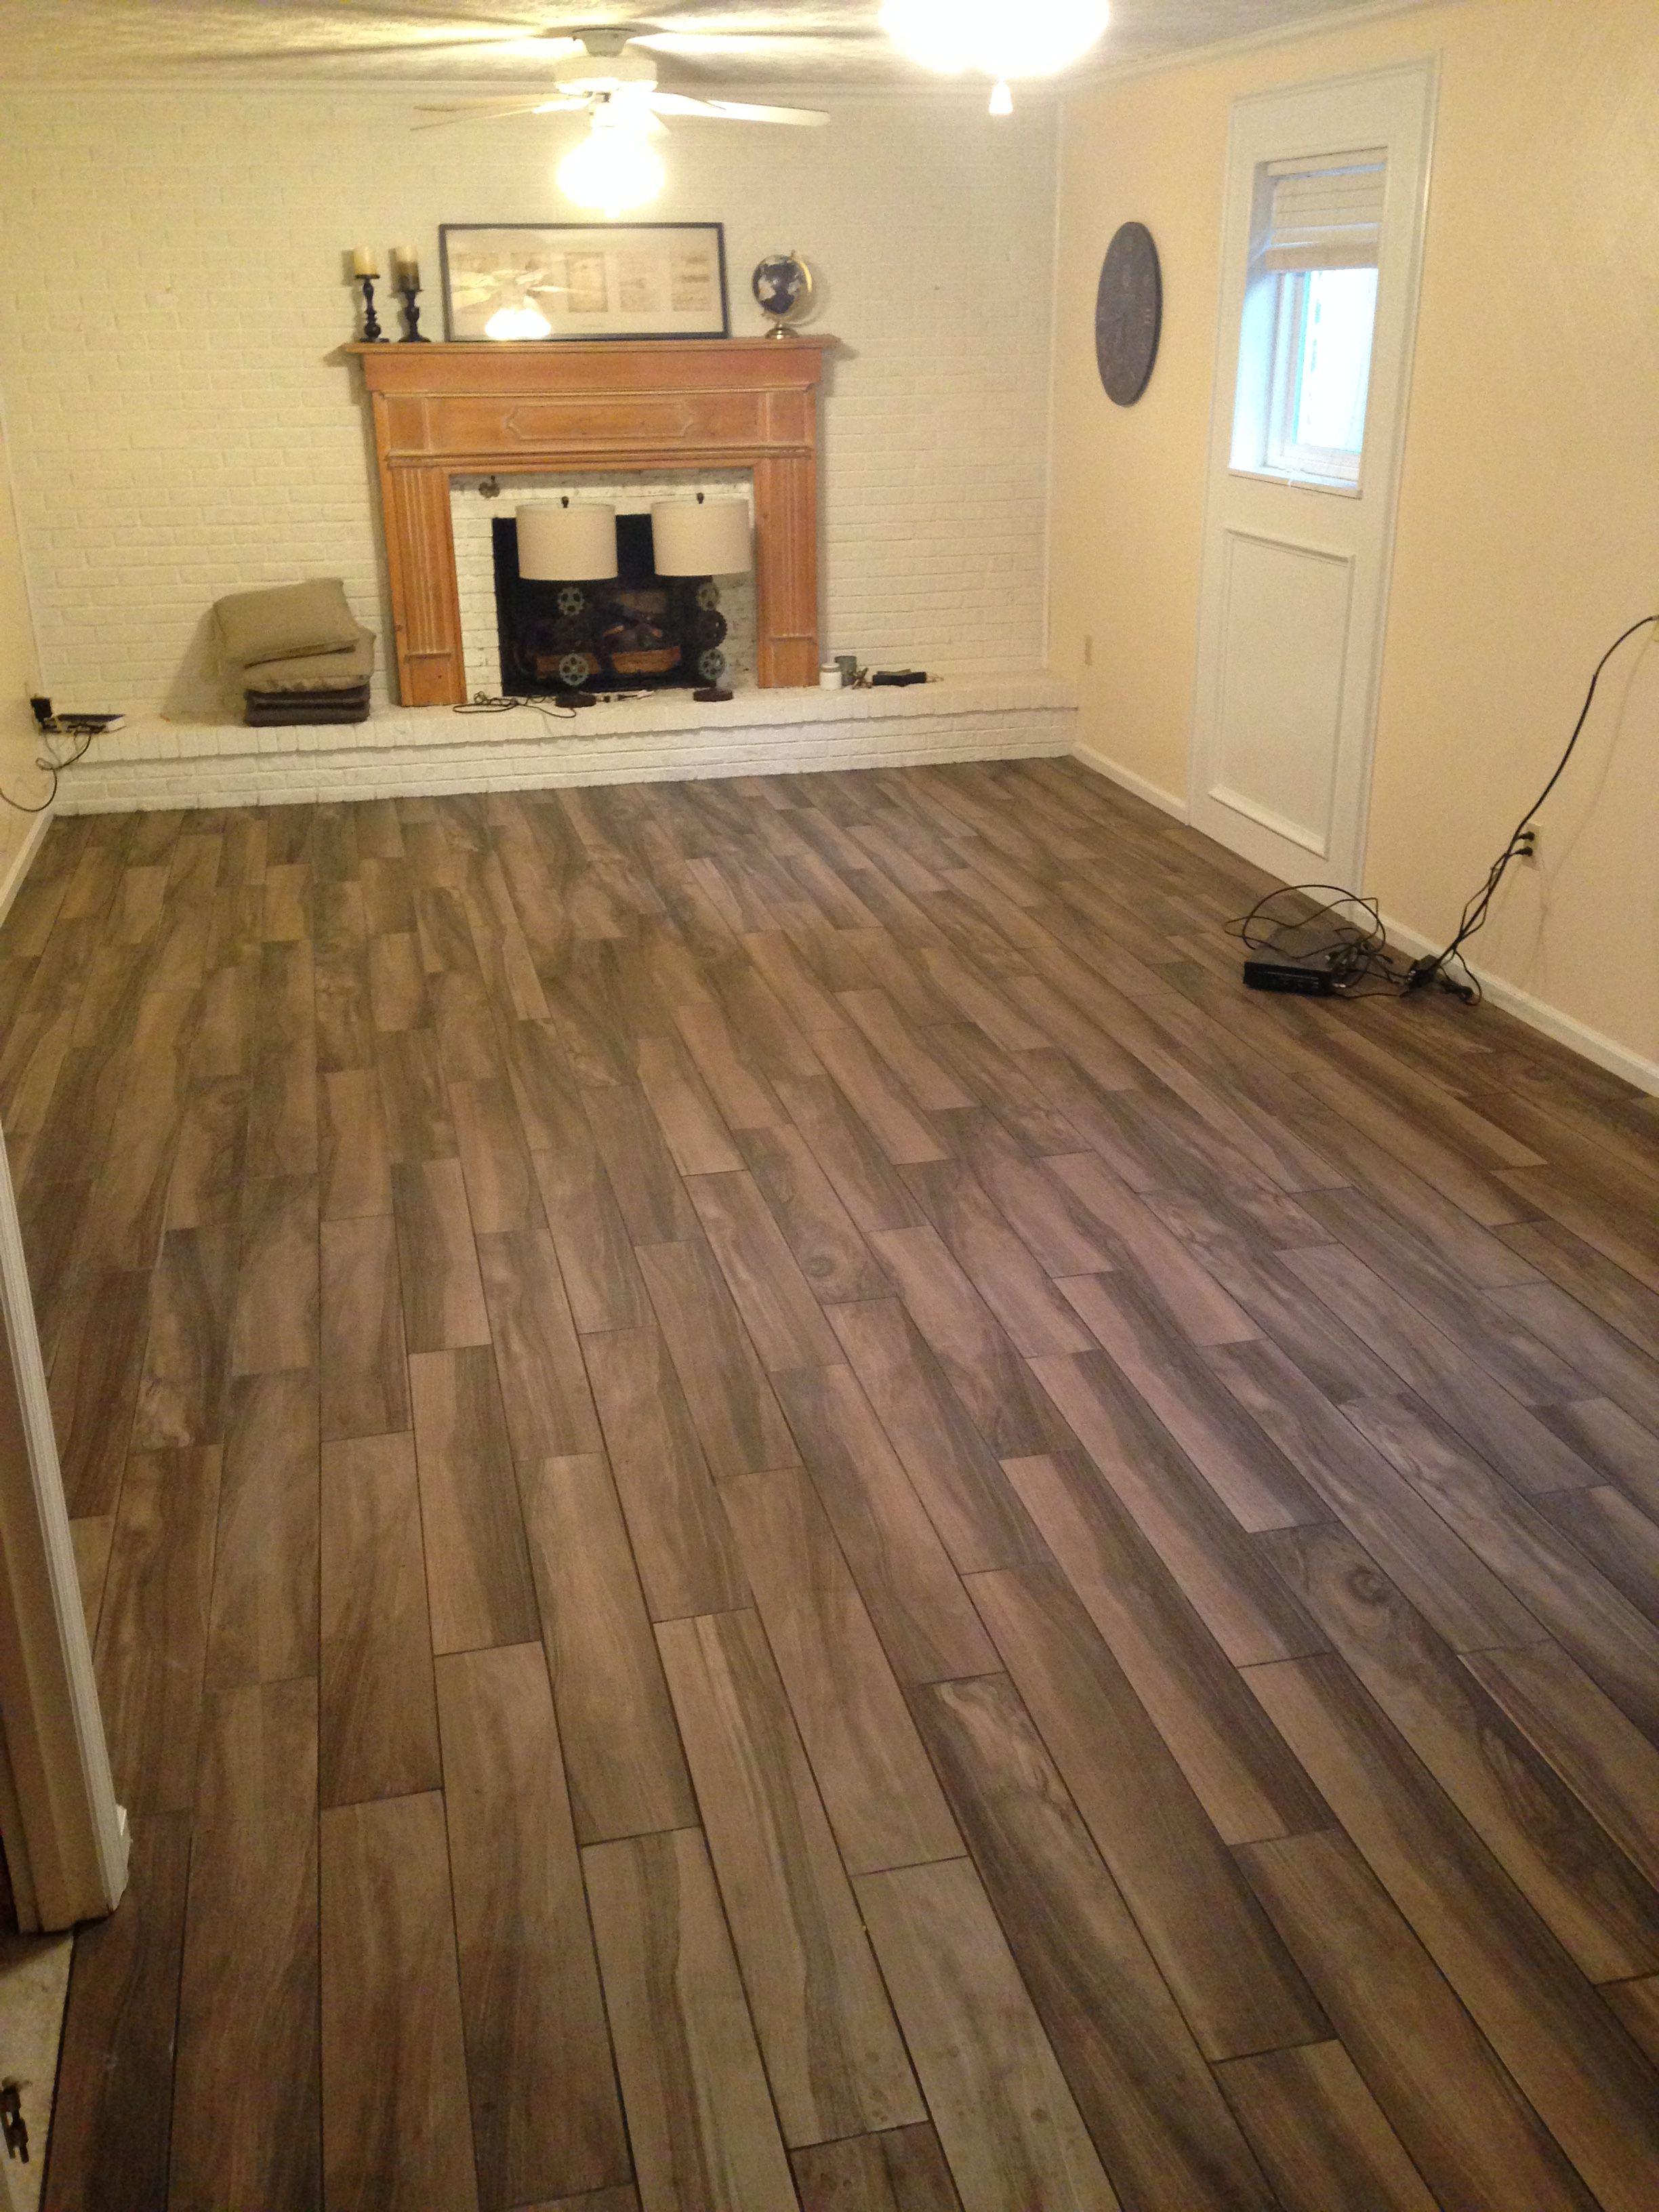 Kaden walnut tile from Lowe's. Wood tile Home renovation